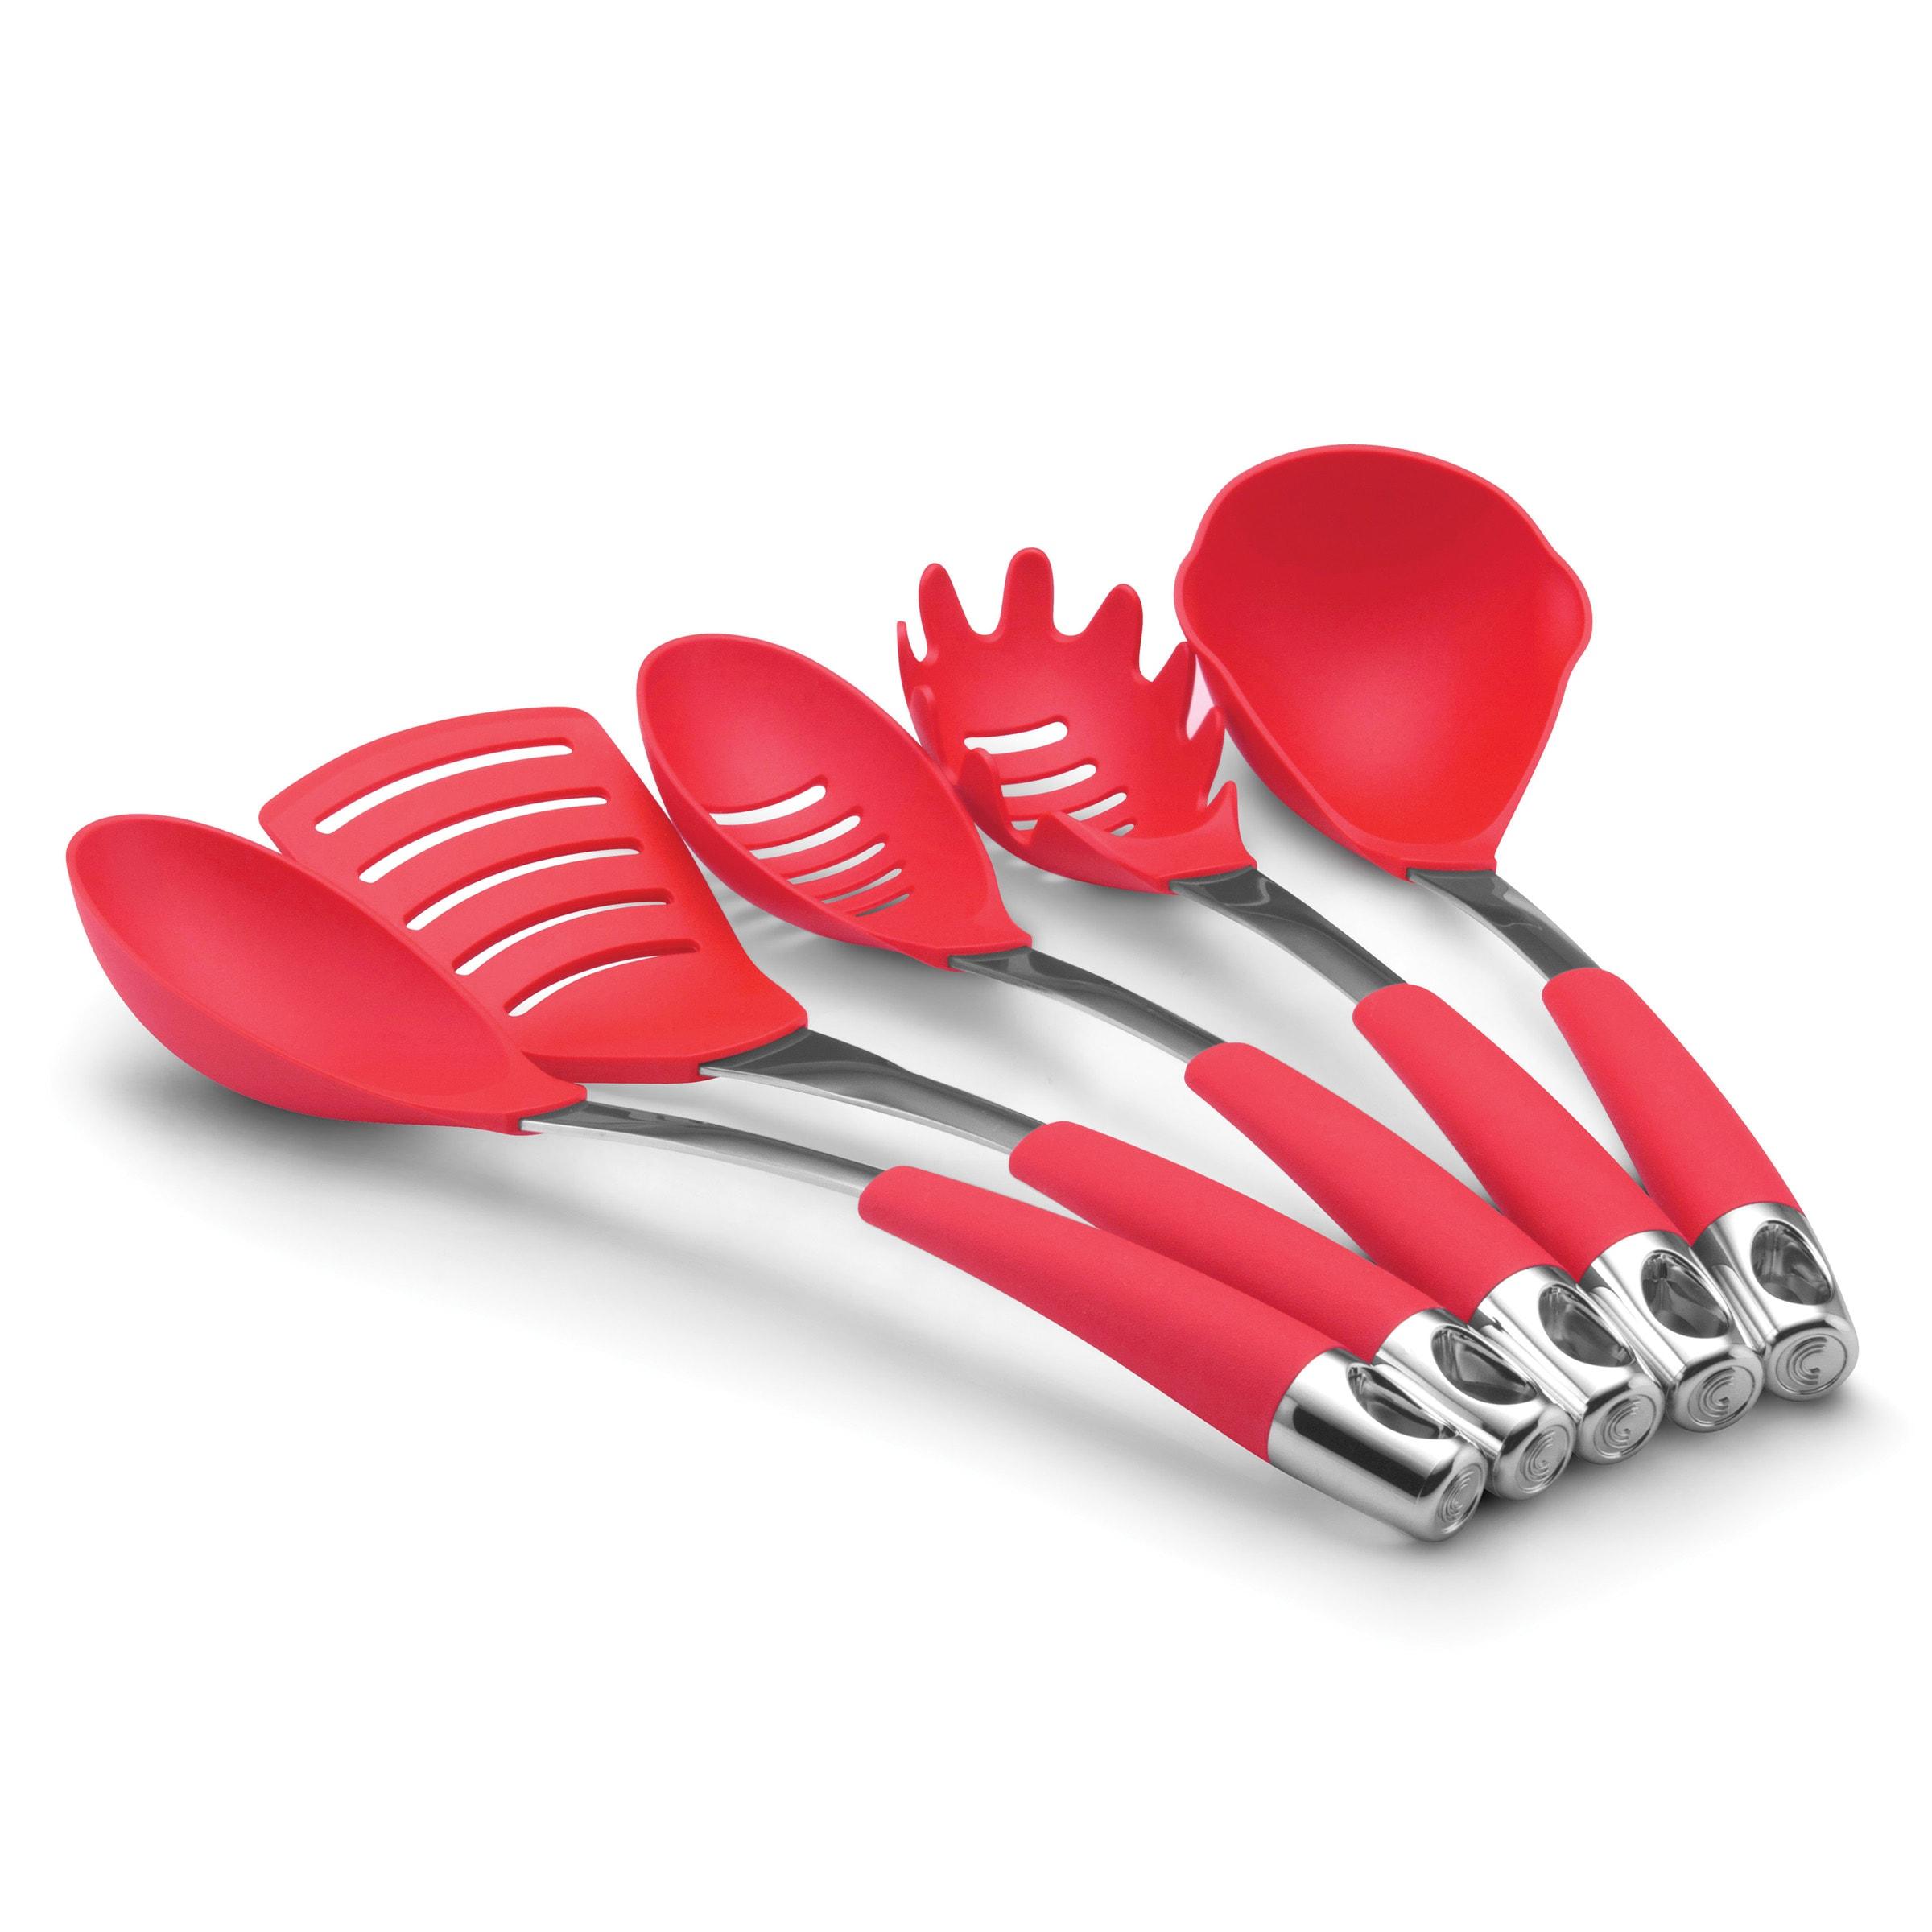 Circulon Red Five-piece Kitchen Utensil Set